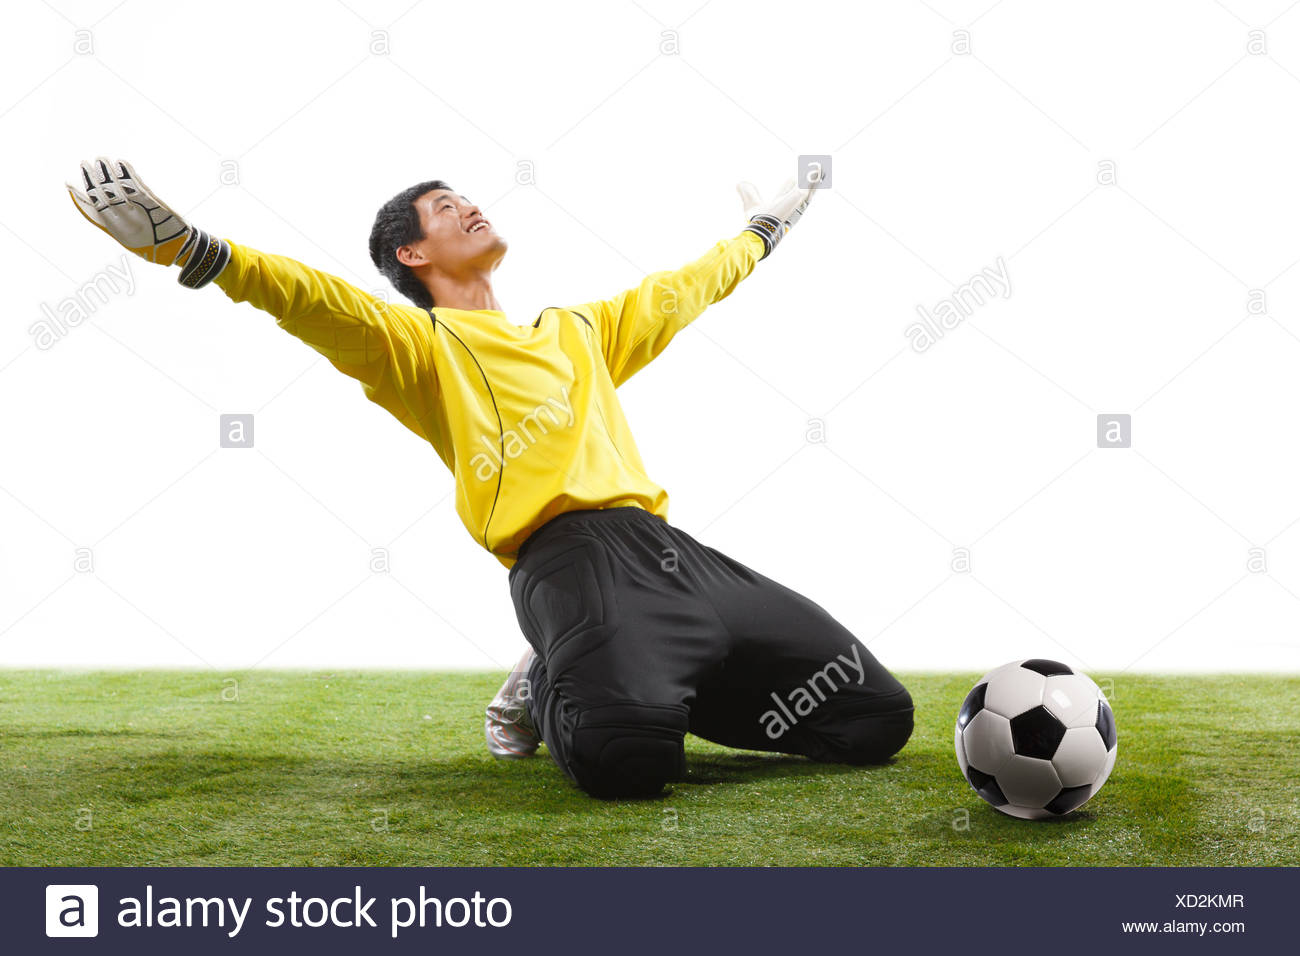 Tread athletes kneeling on the ground - Stock Image